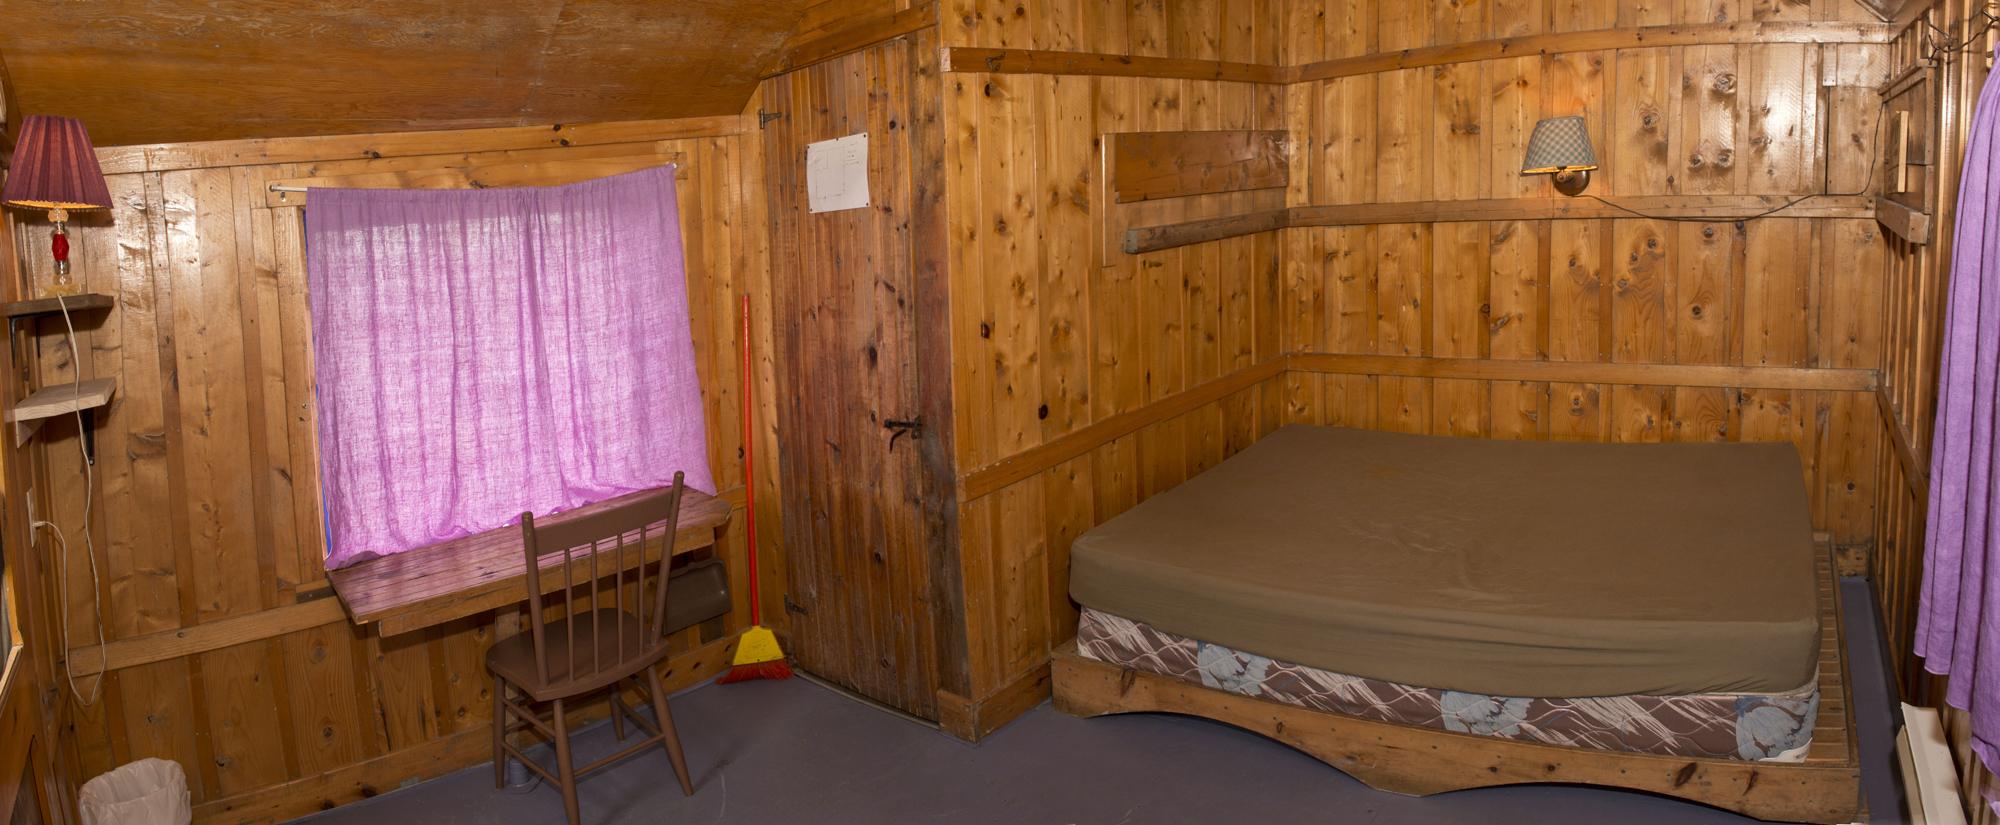 Cabin #1 - Main Interior Panorama